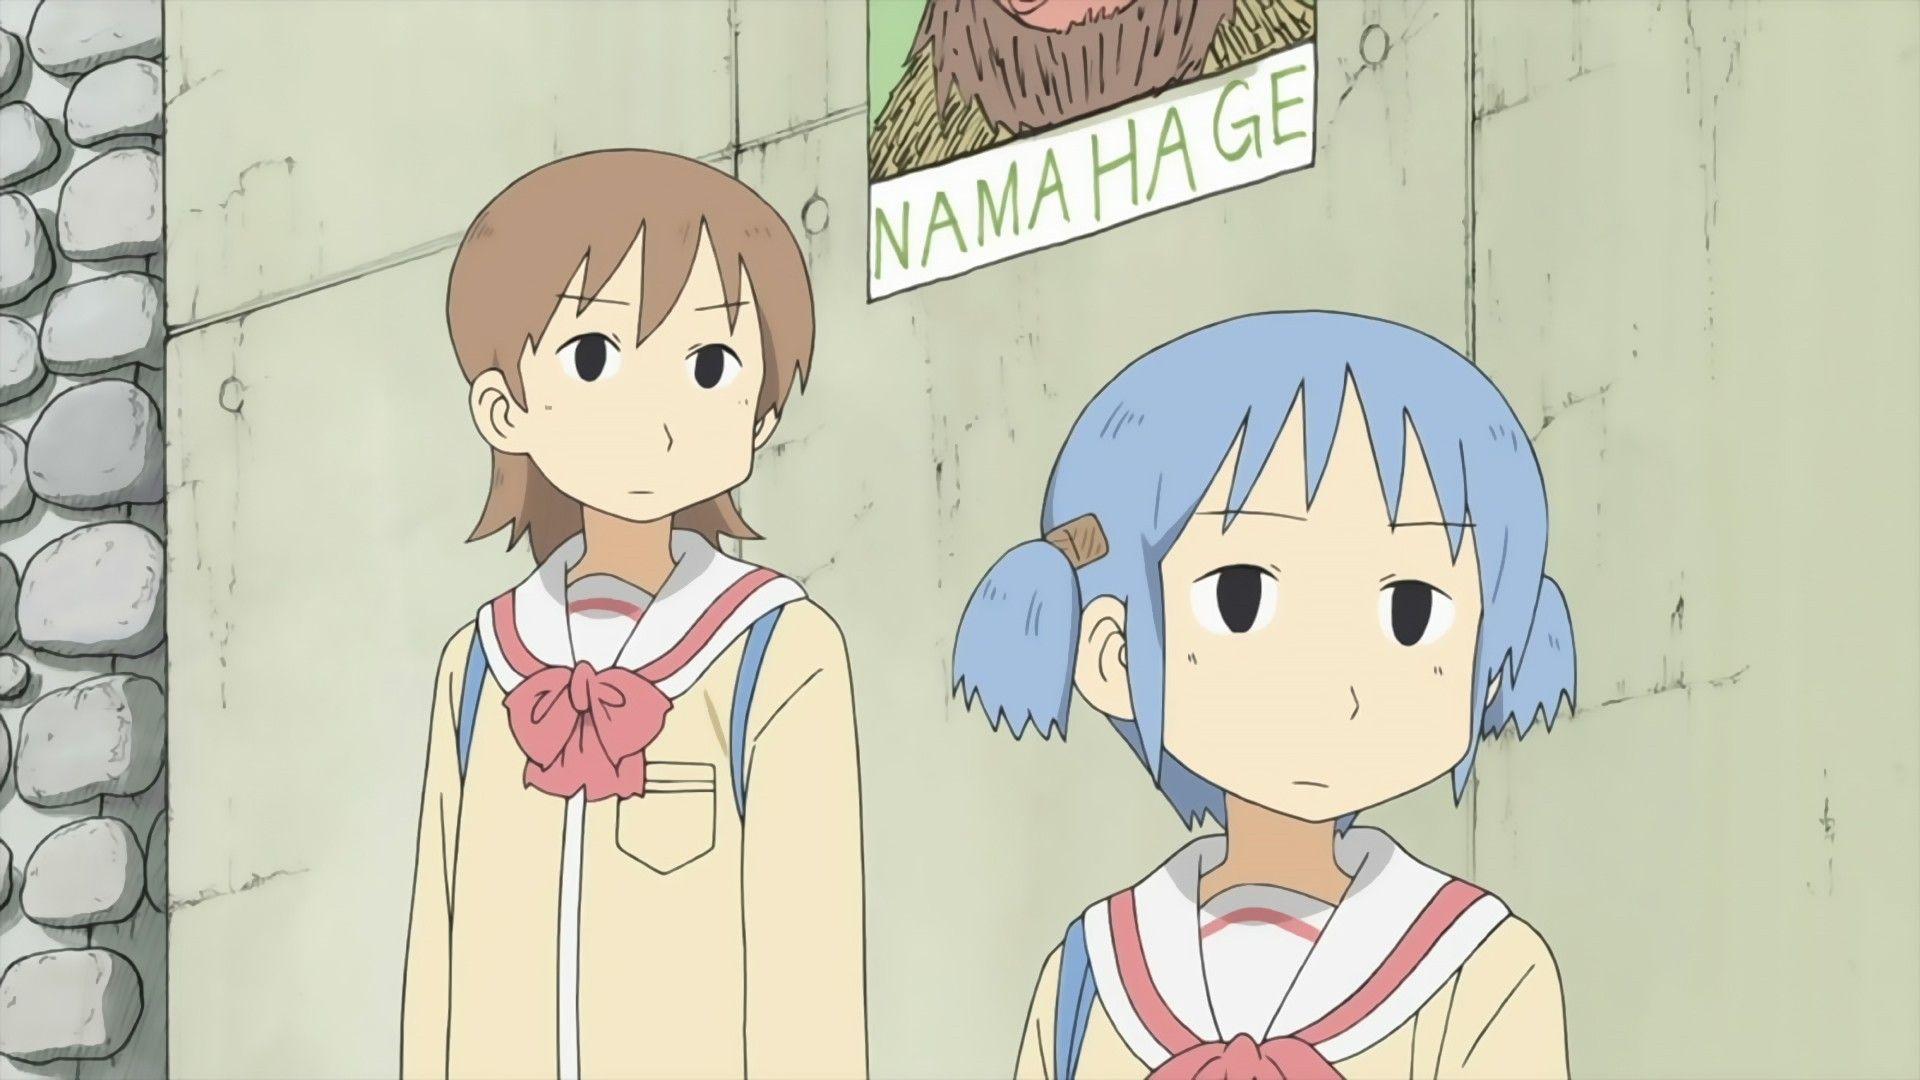 Nichijou Computer Wallpapers Desktop Backgrounds 1920x1080 Id 245484 Nichijou Anime Anime Chibi